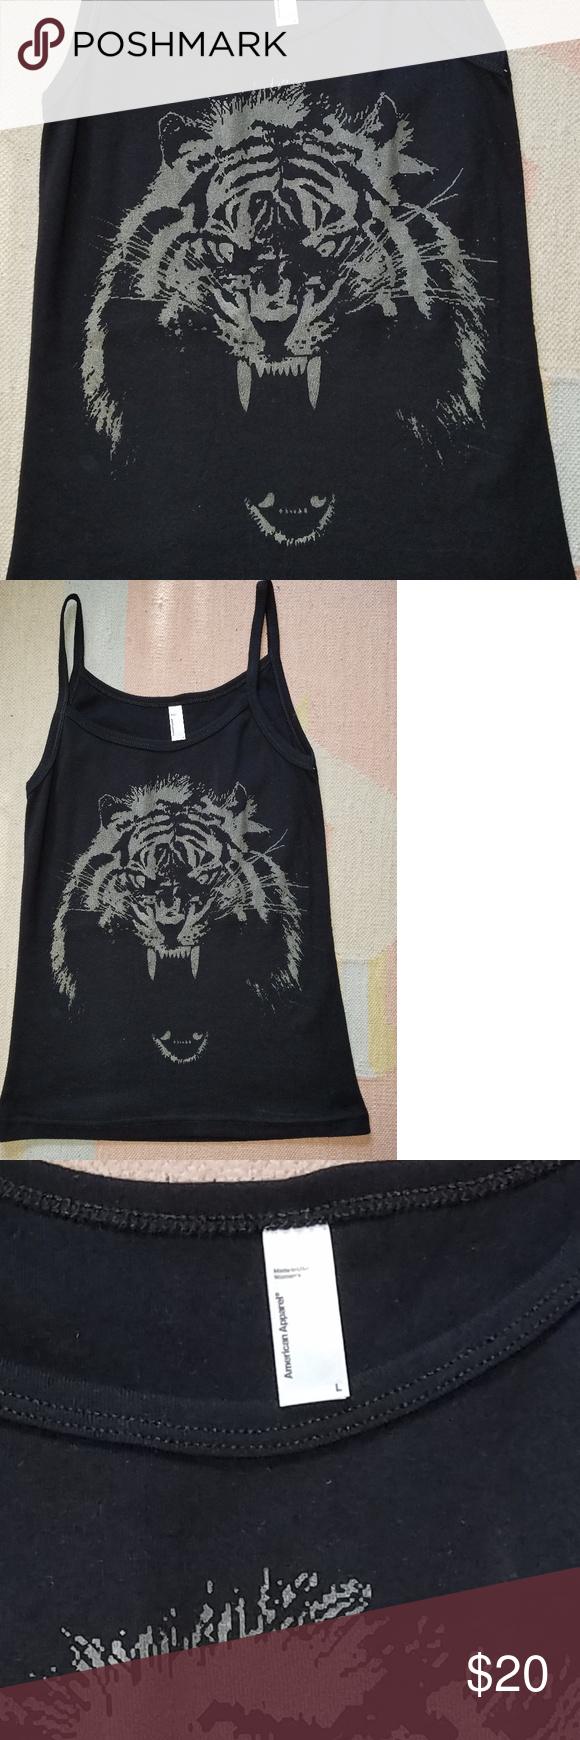 0432a3344e8c64 Glow in the dark tiger tank! Original tiger artwork silk-screened in glow  in the dark ink! Limited edition